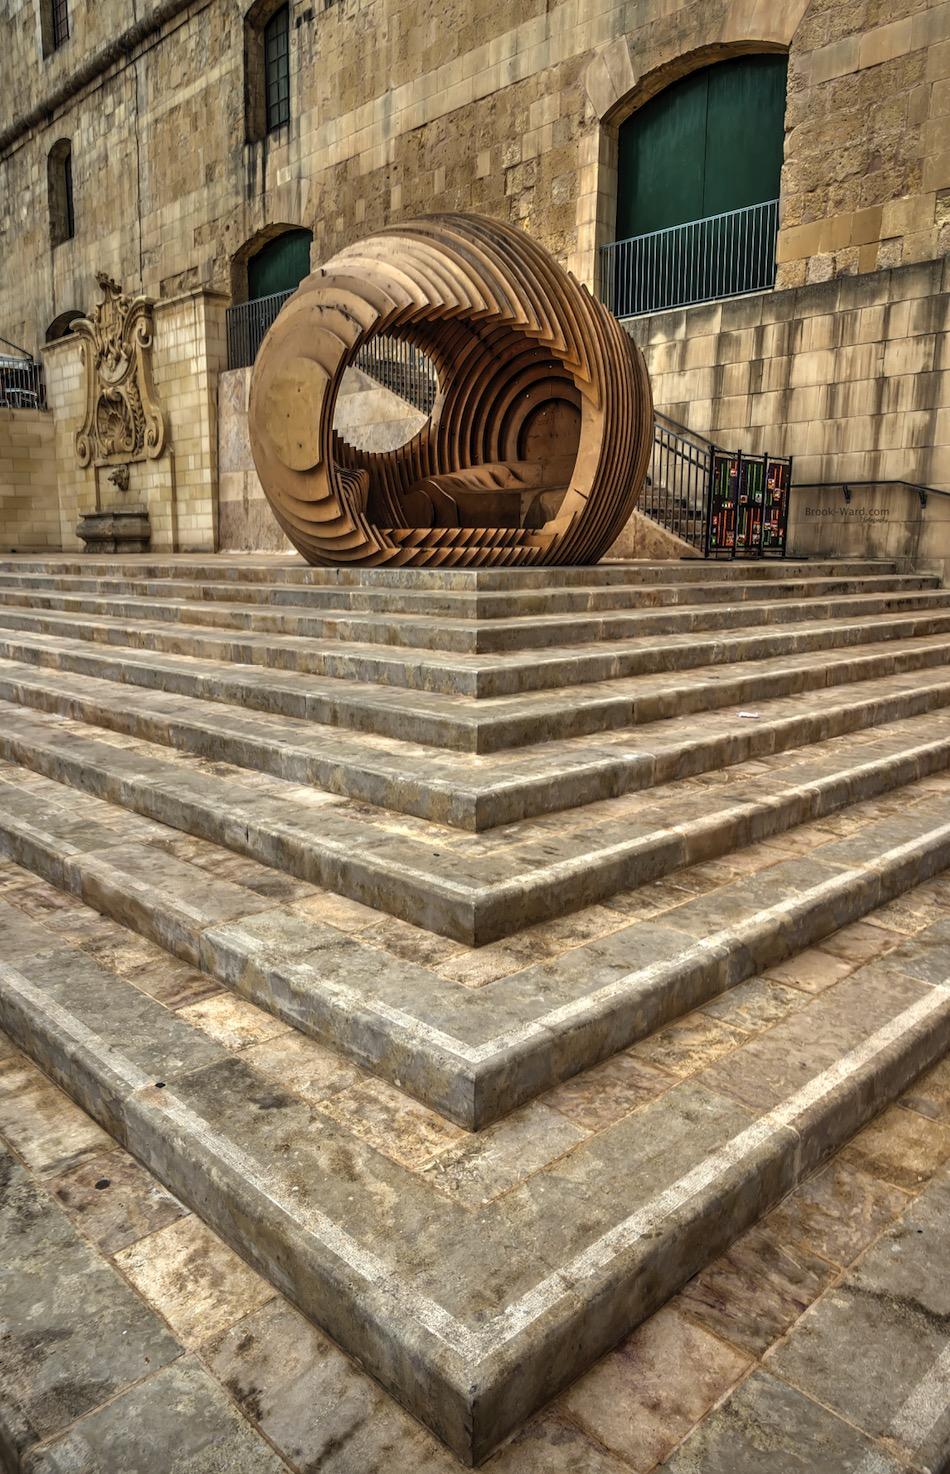 Malta Sculpture